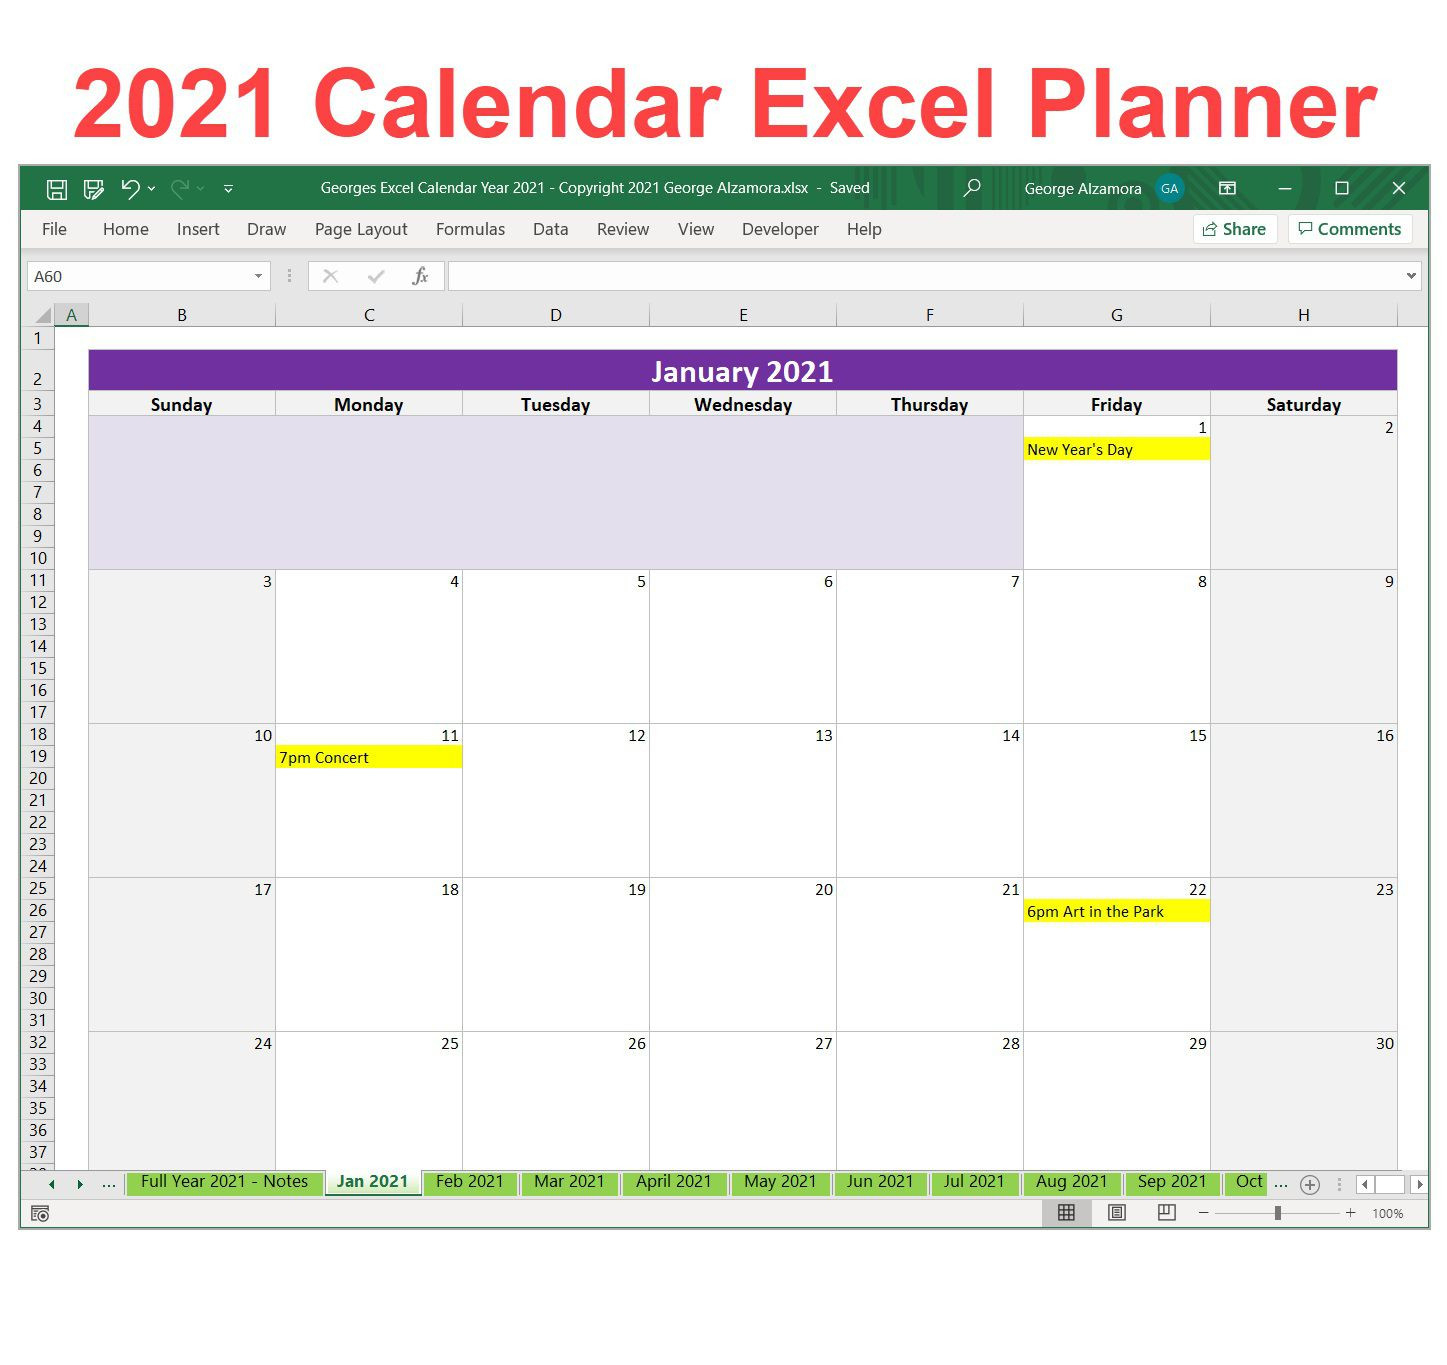 Excel 2021 Calendar Insight Template ~ Addictionary-Excel Calendar Template 2021